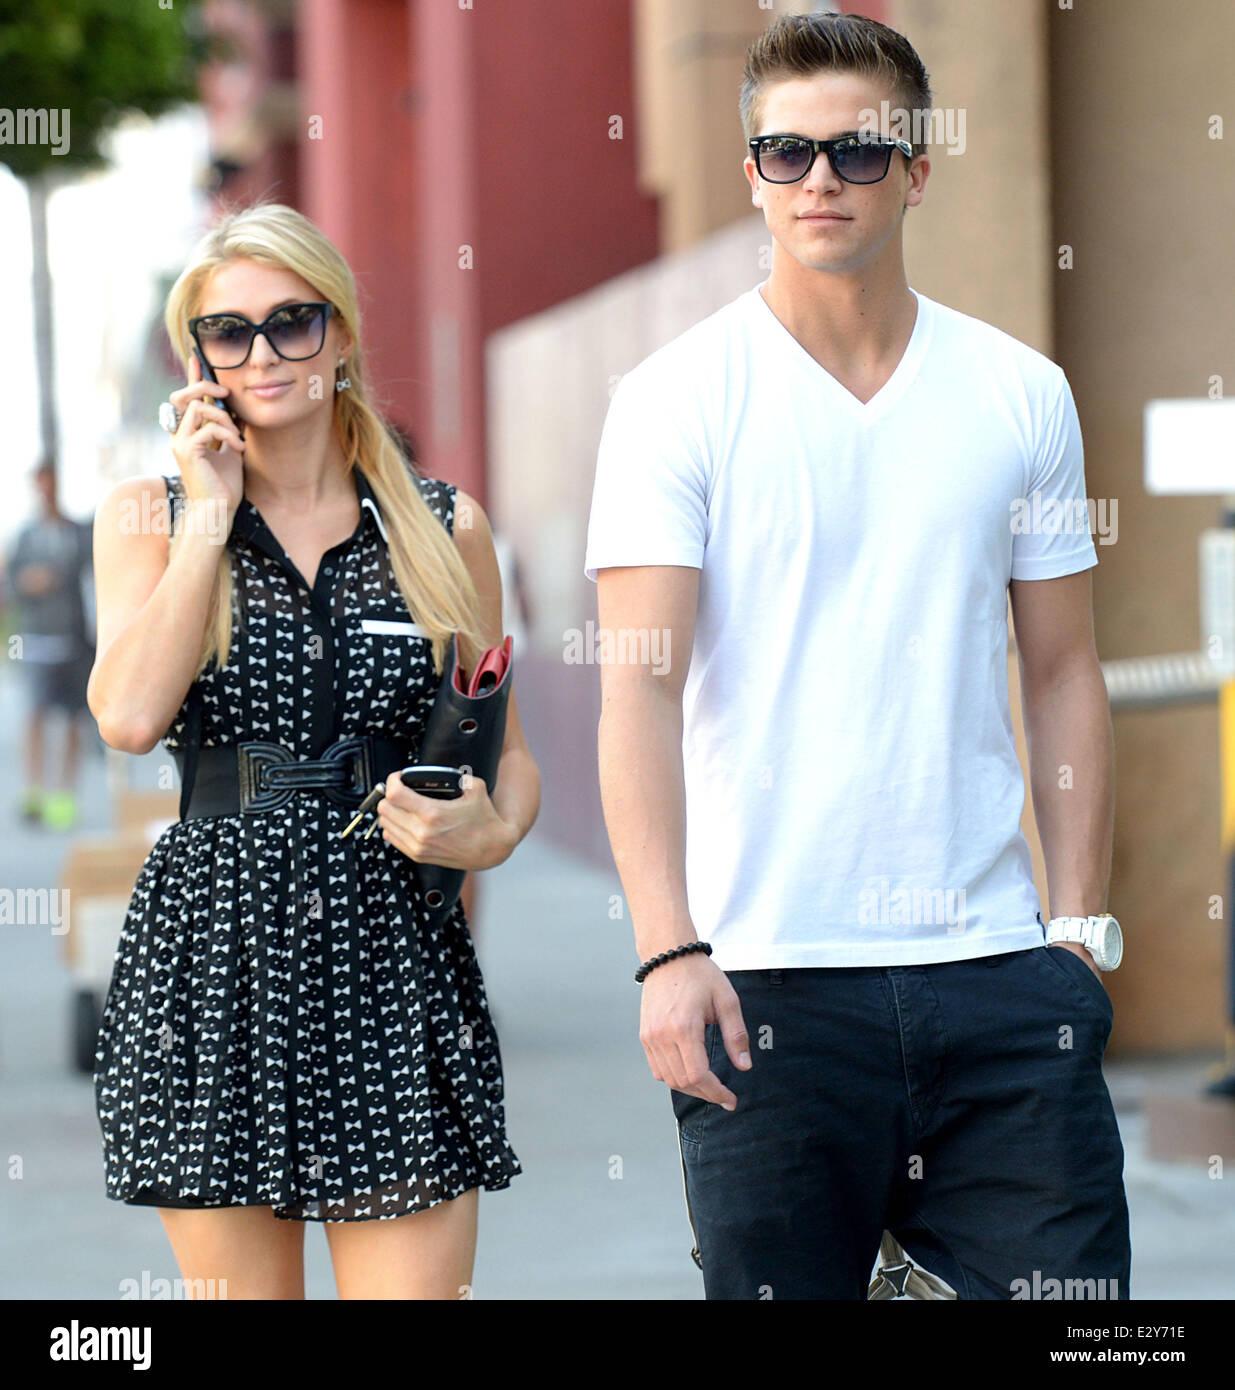 Paris Hilton dating multi-millionaire